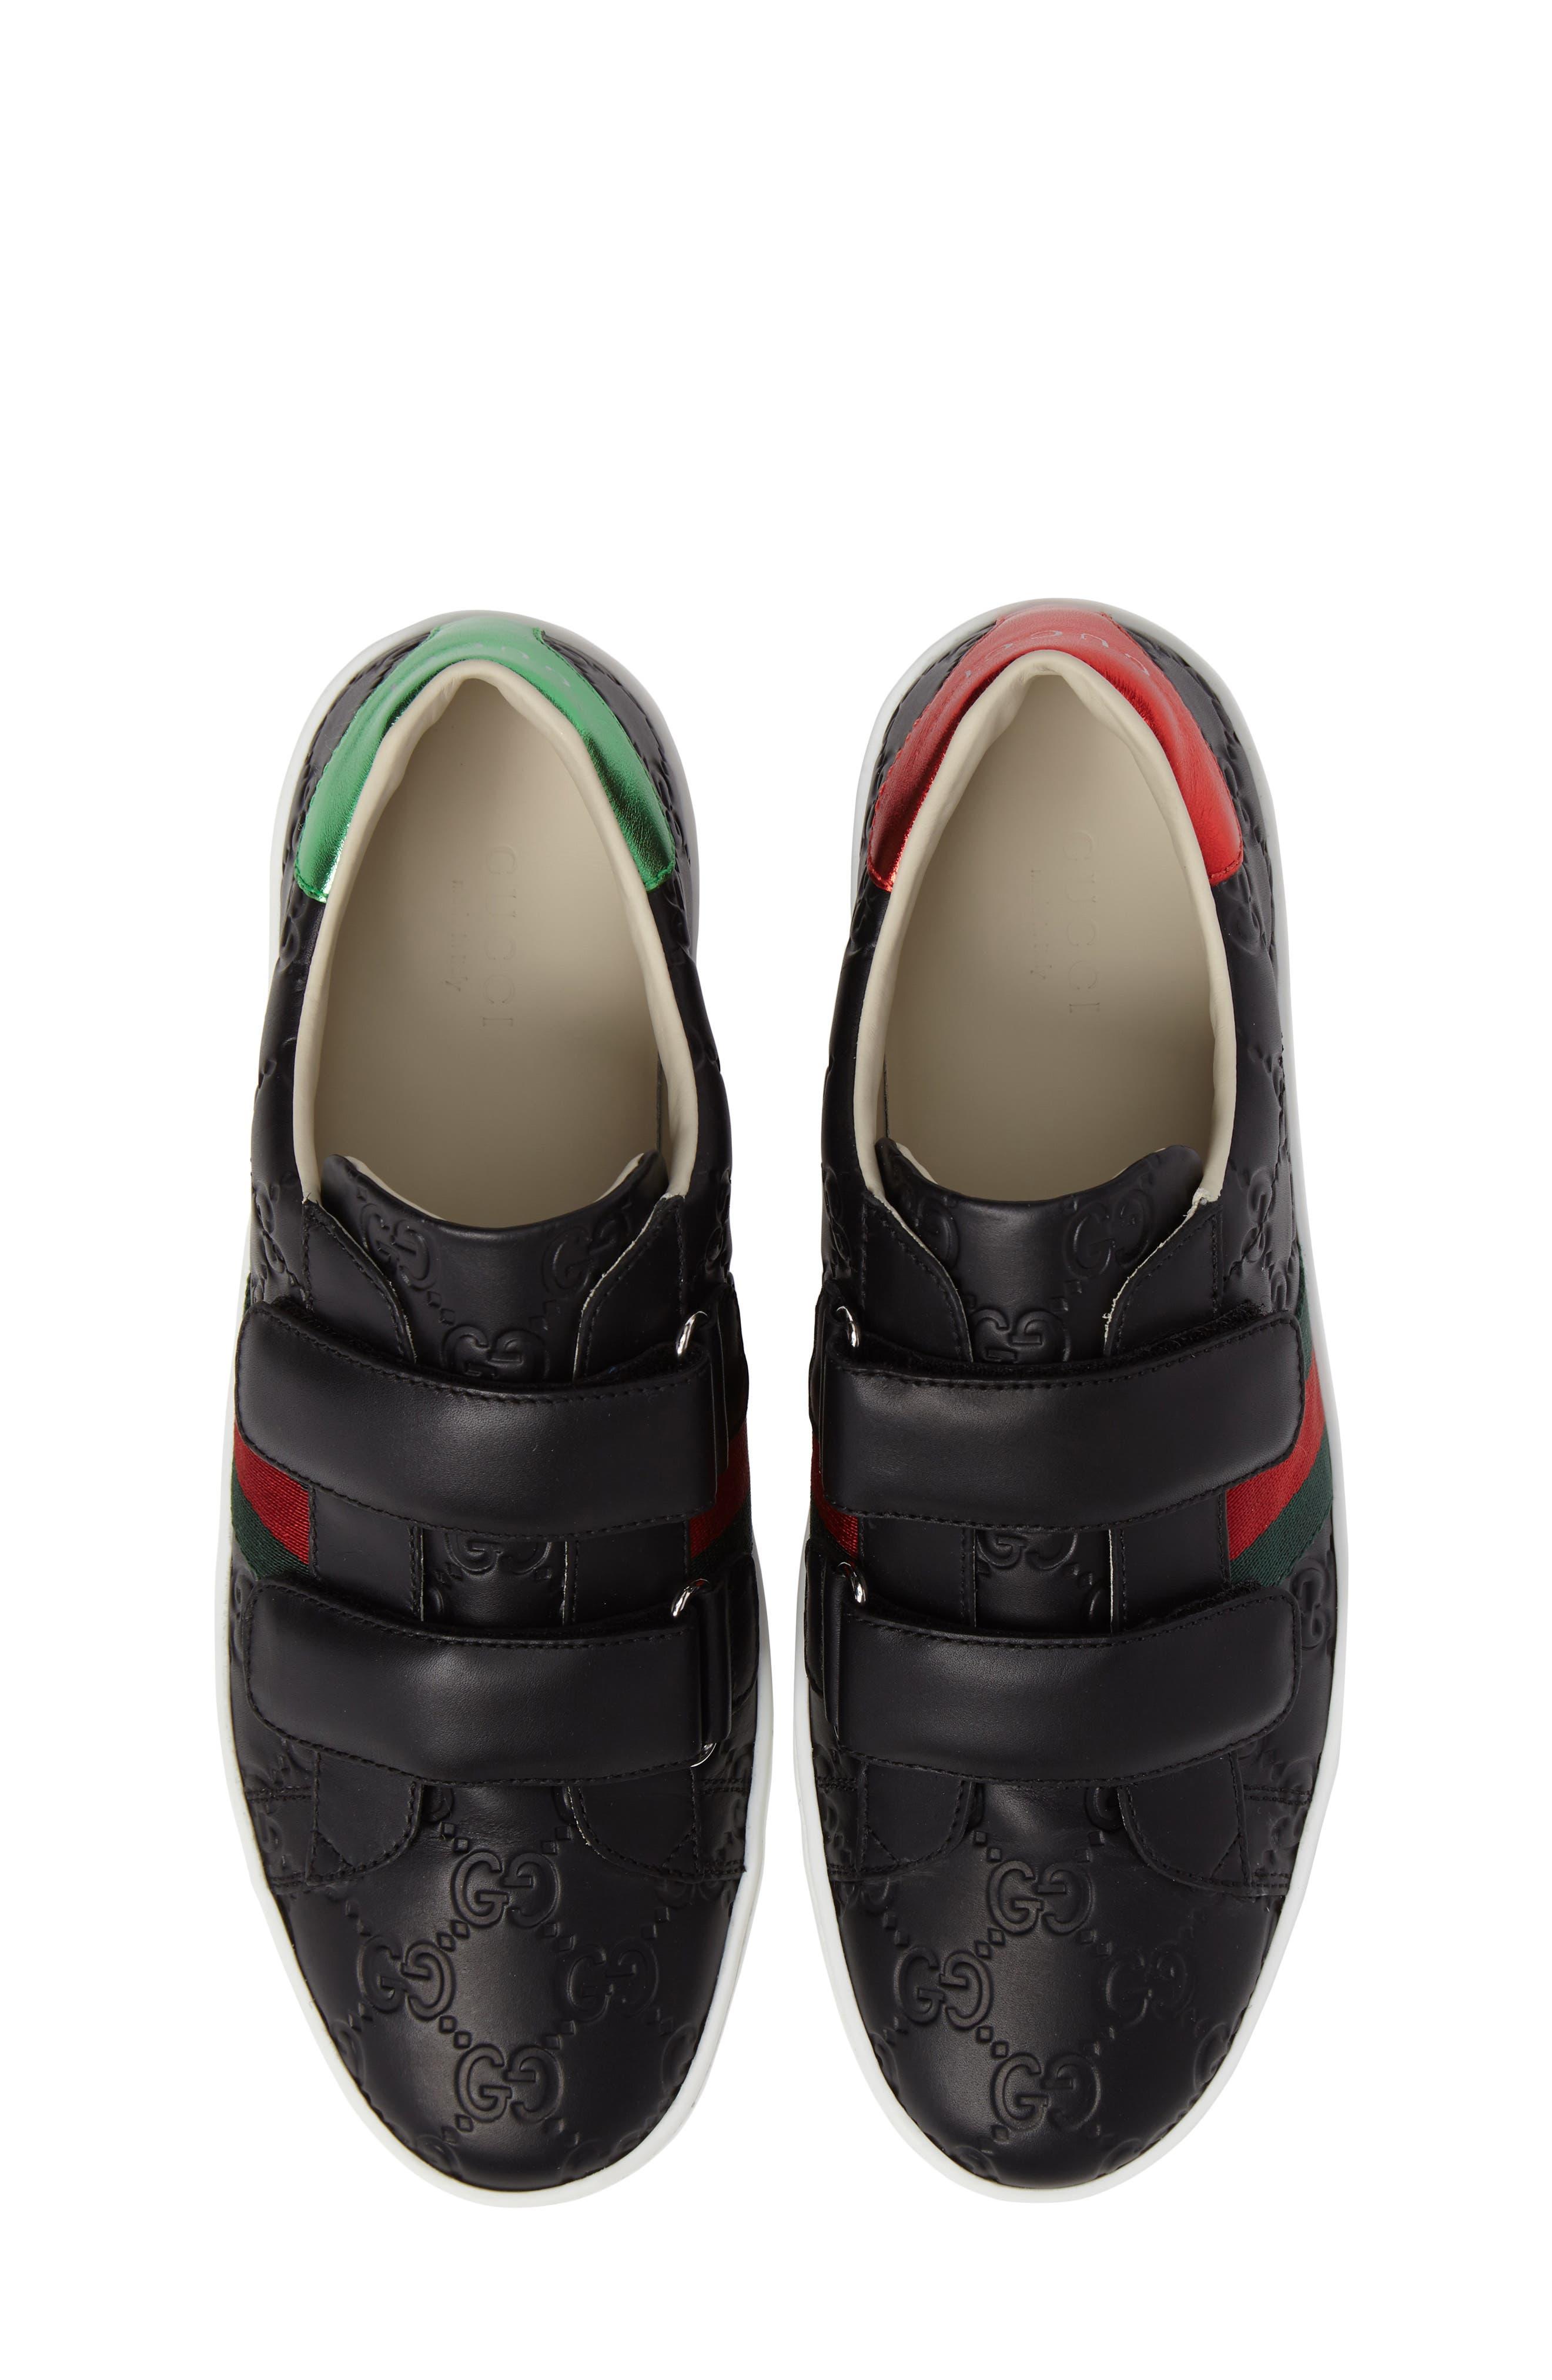 Kids Gucci New Ace Sneaker Size 4US  36EU  Blue